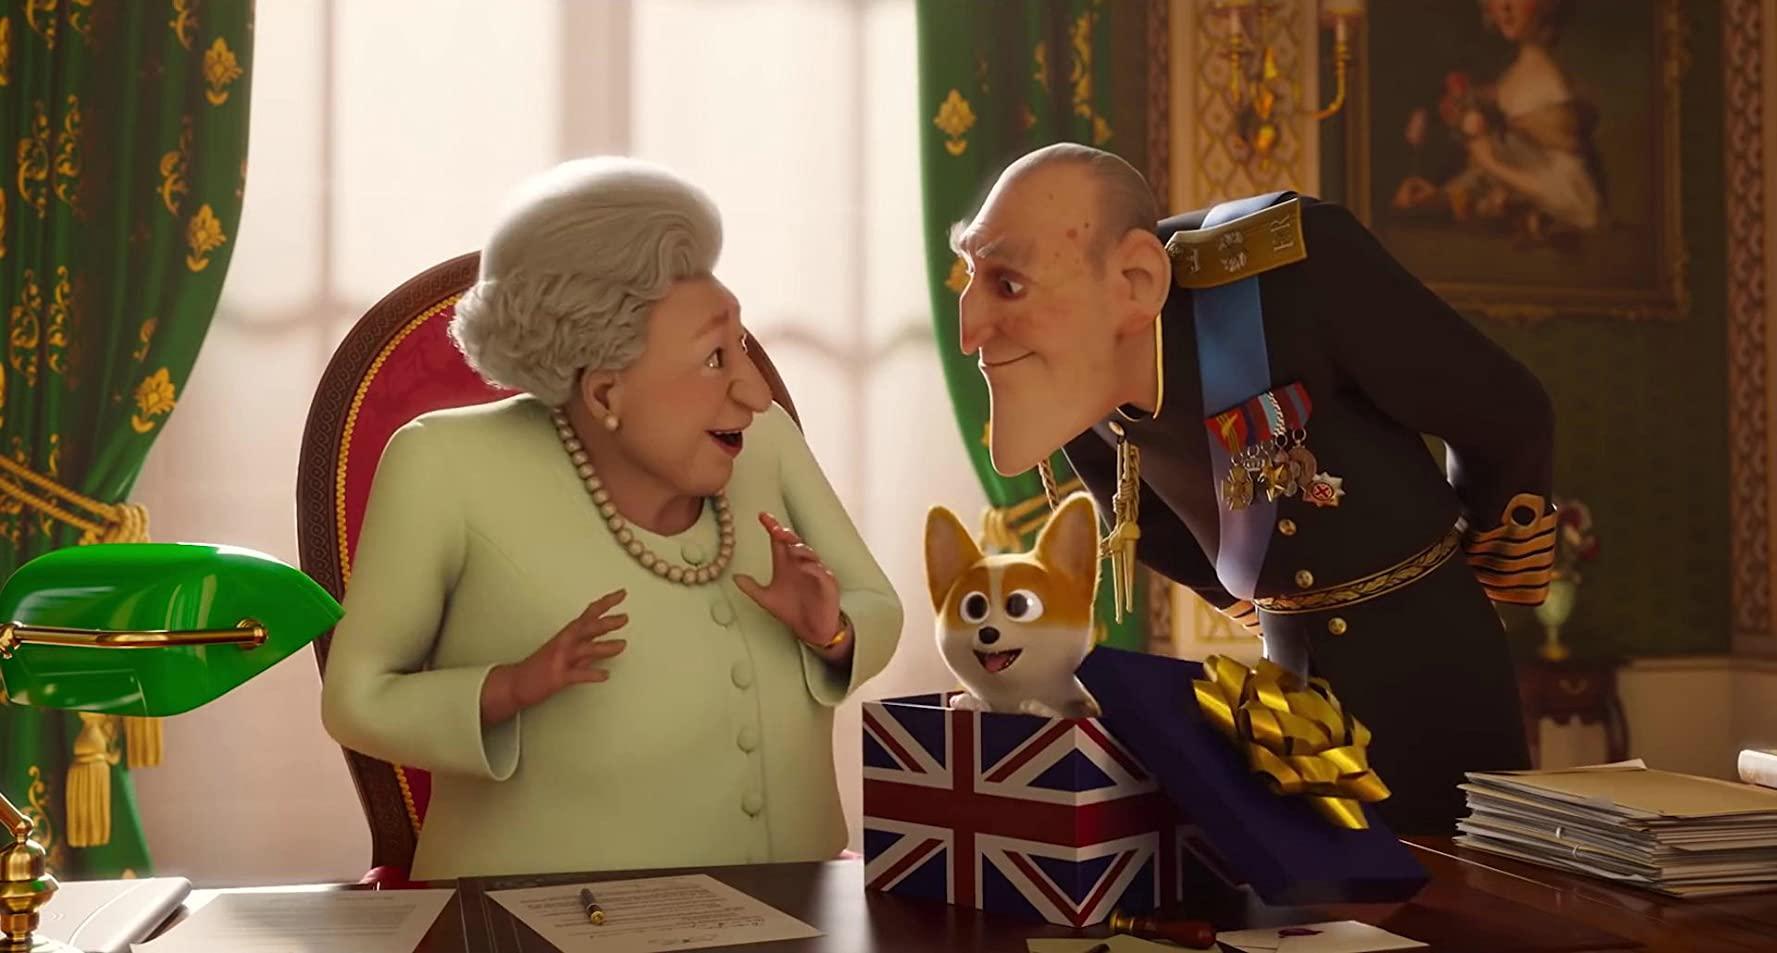 مشاهدة فيلم The Queen's Corgi (2019) مترجم HD اون لاين